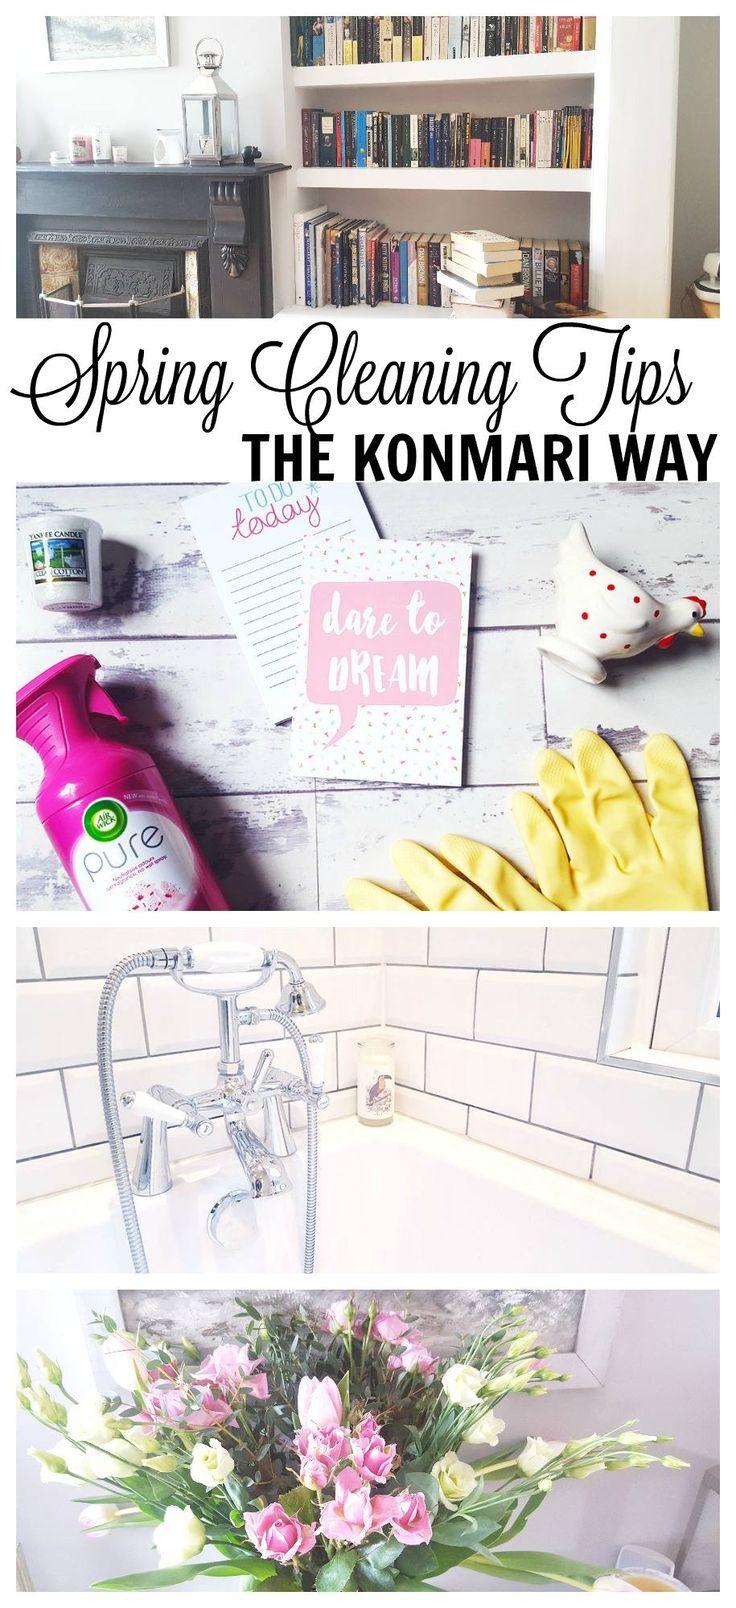 5 Spring Cleaning Tips the Konmari Way!